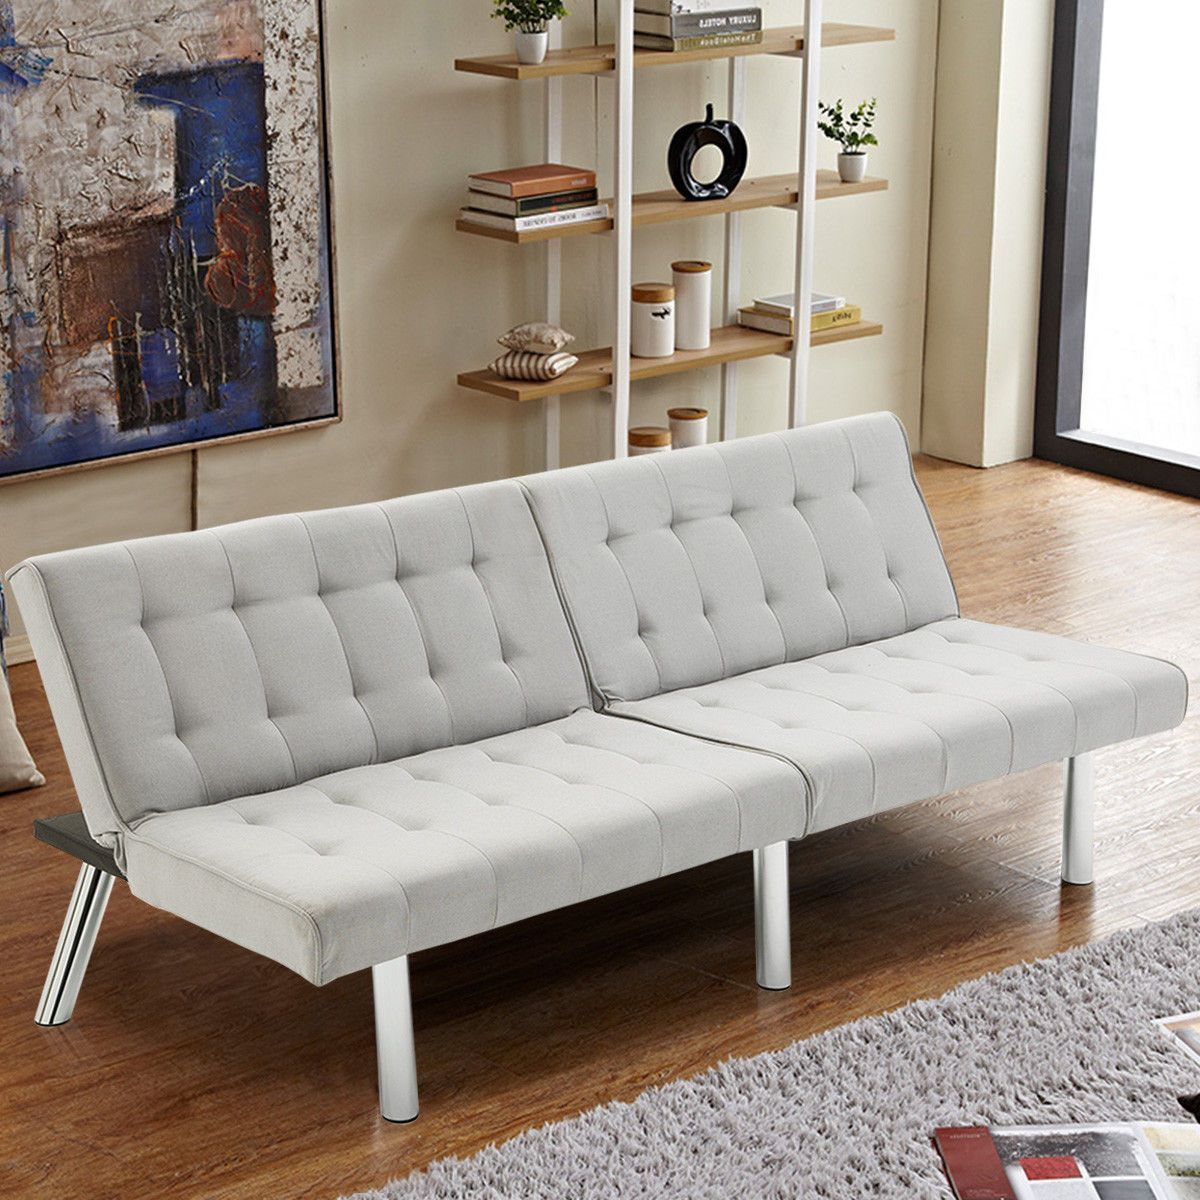 Giantex Modern Living Room Furniture Split Back Futon Sofa Bed